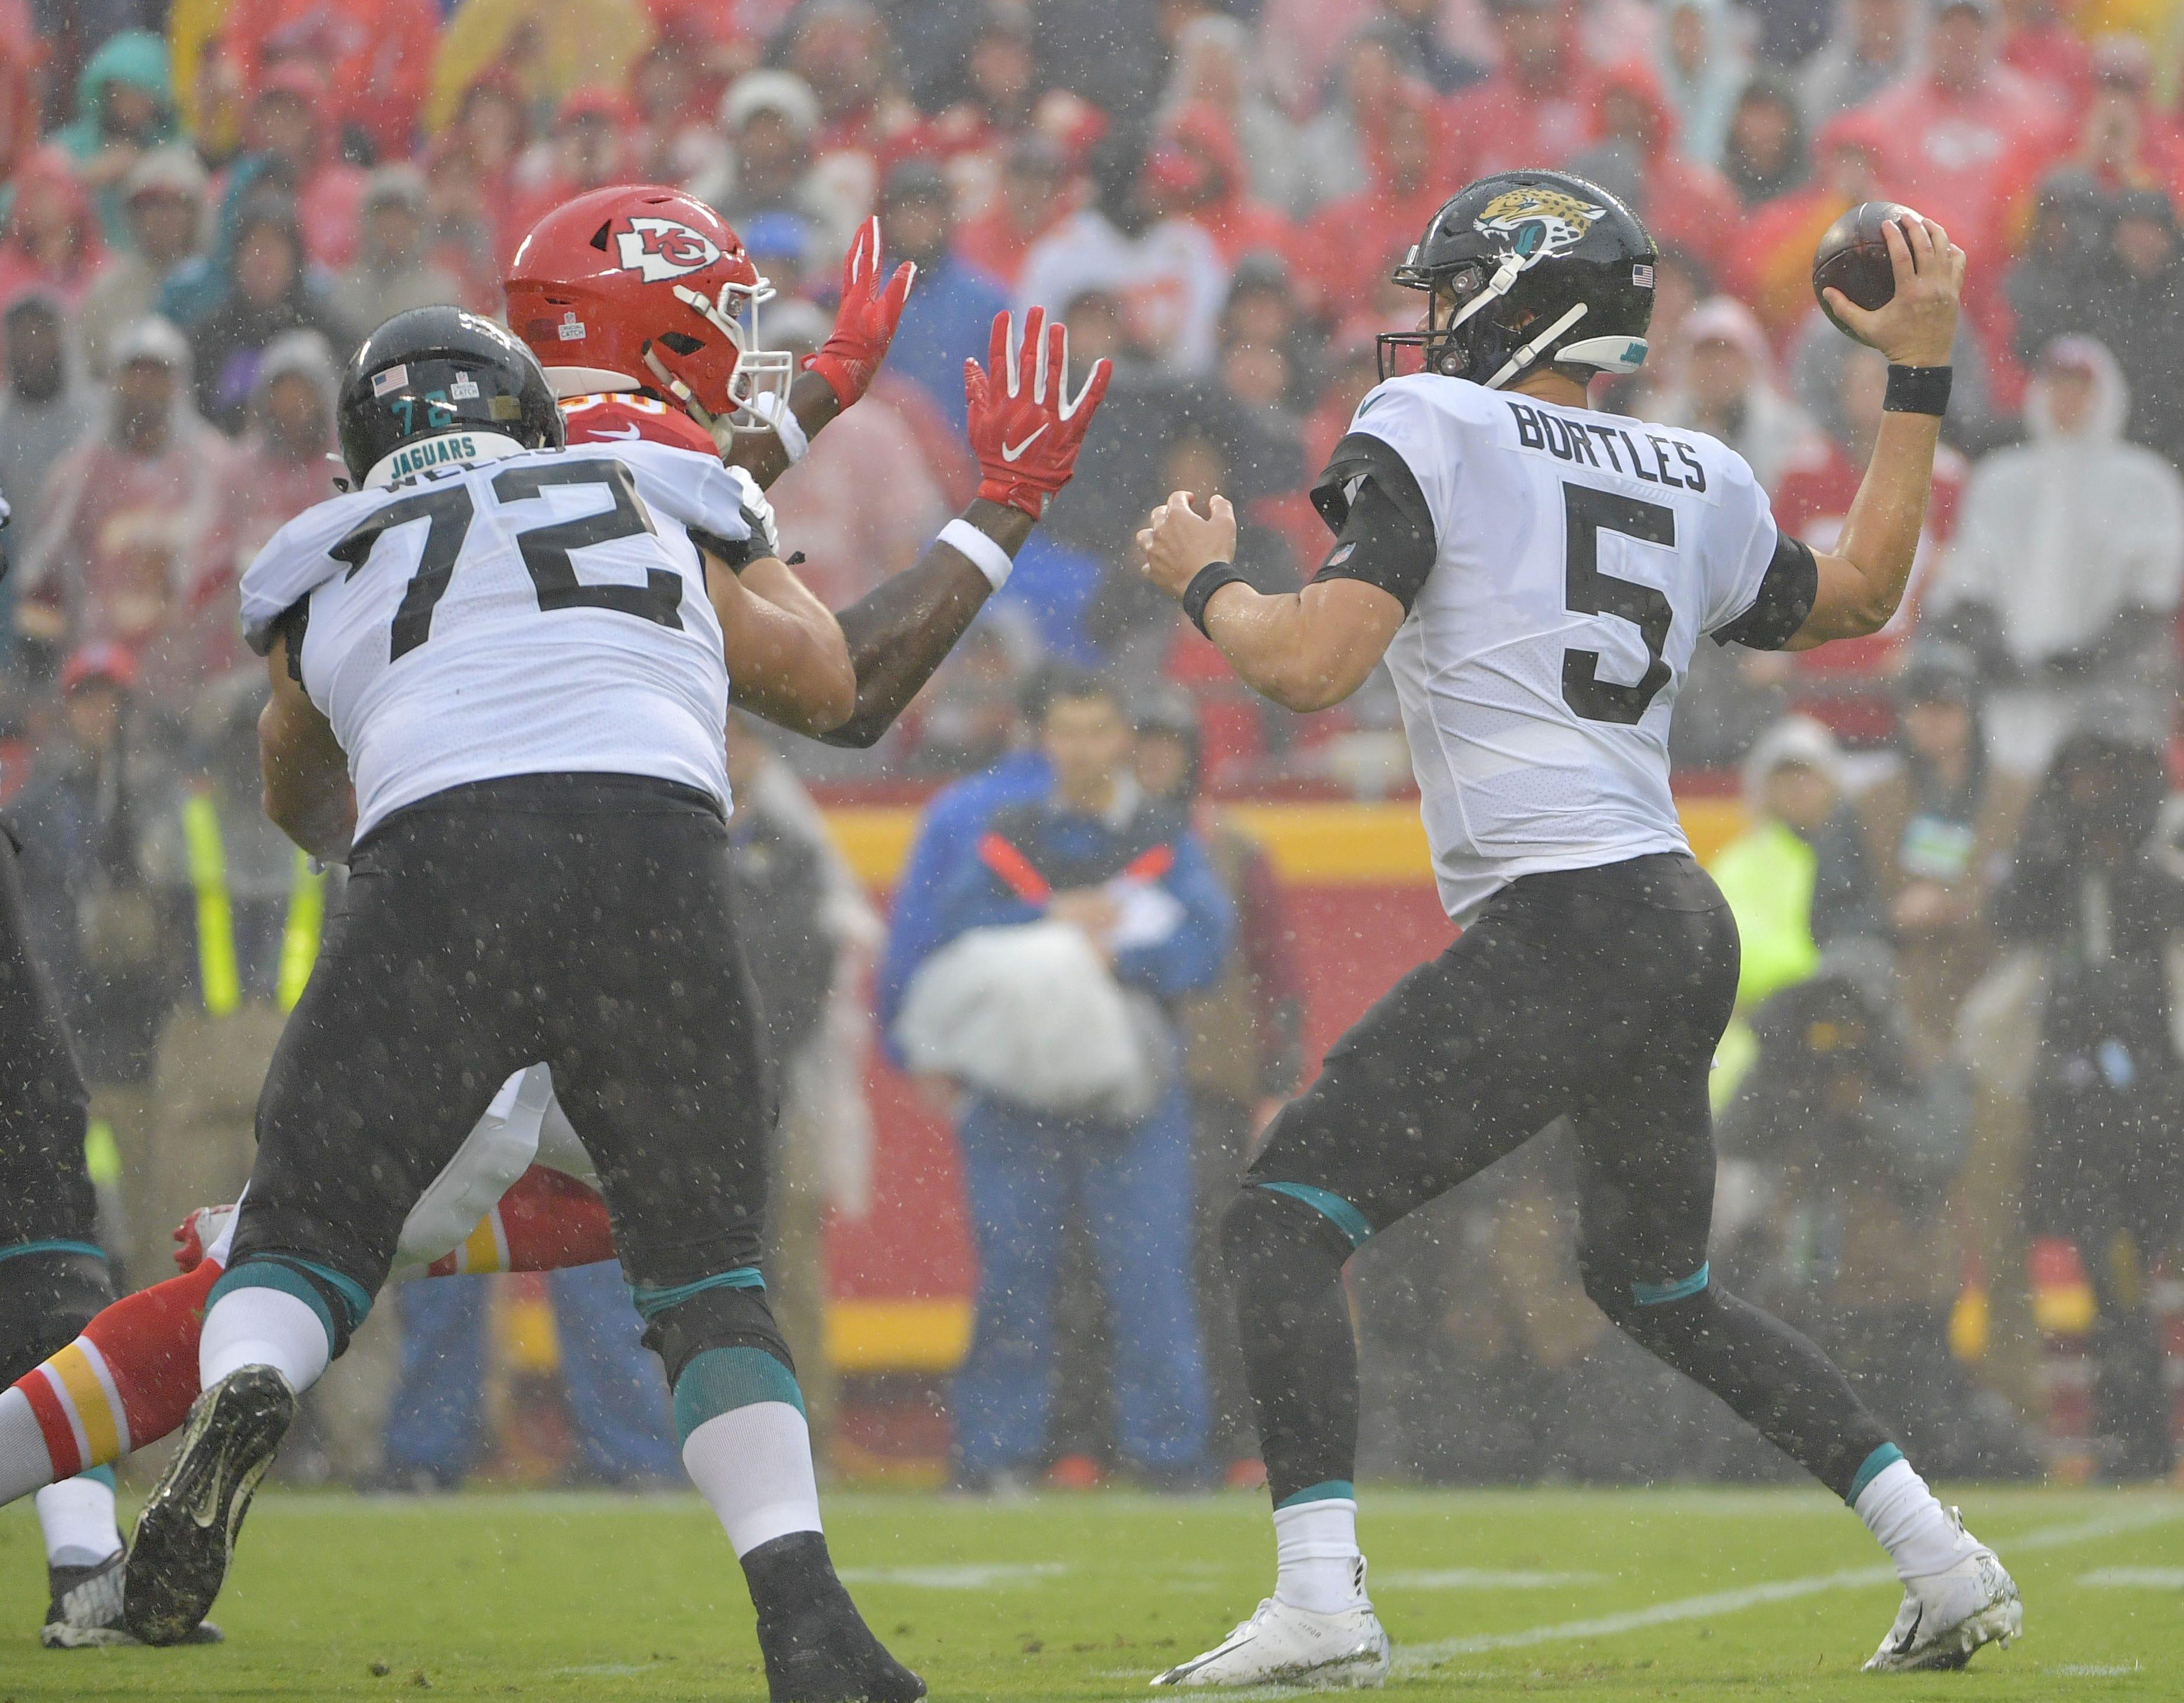 Week 5: Rain falls early in the Kansas City Chiefs' 30-14 win over the Jacksonville Jaguars at Arrowhead Stadium.